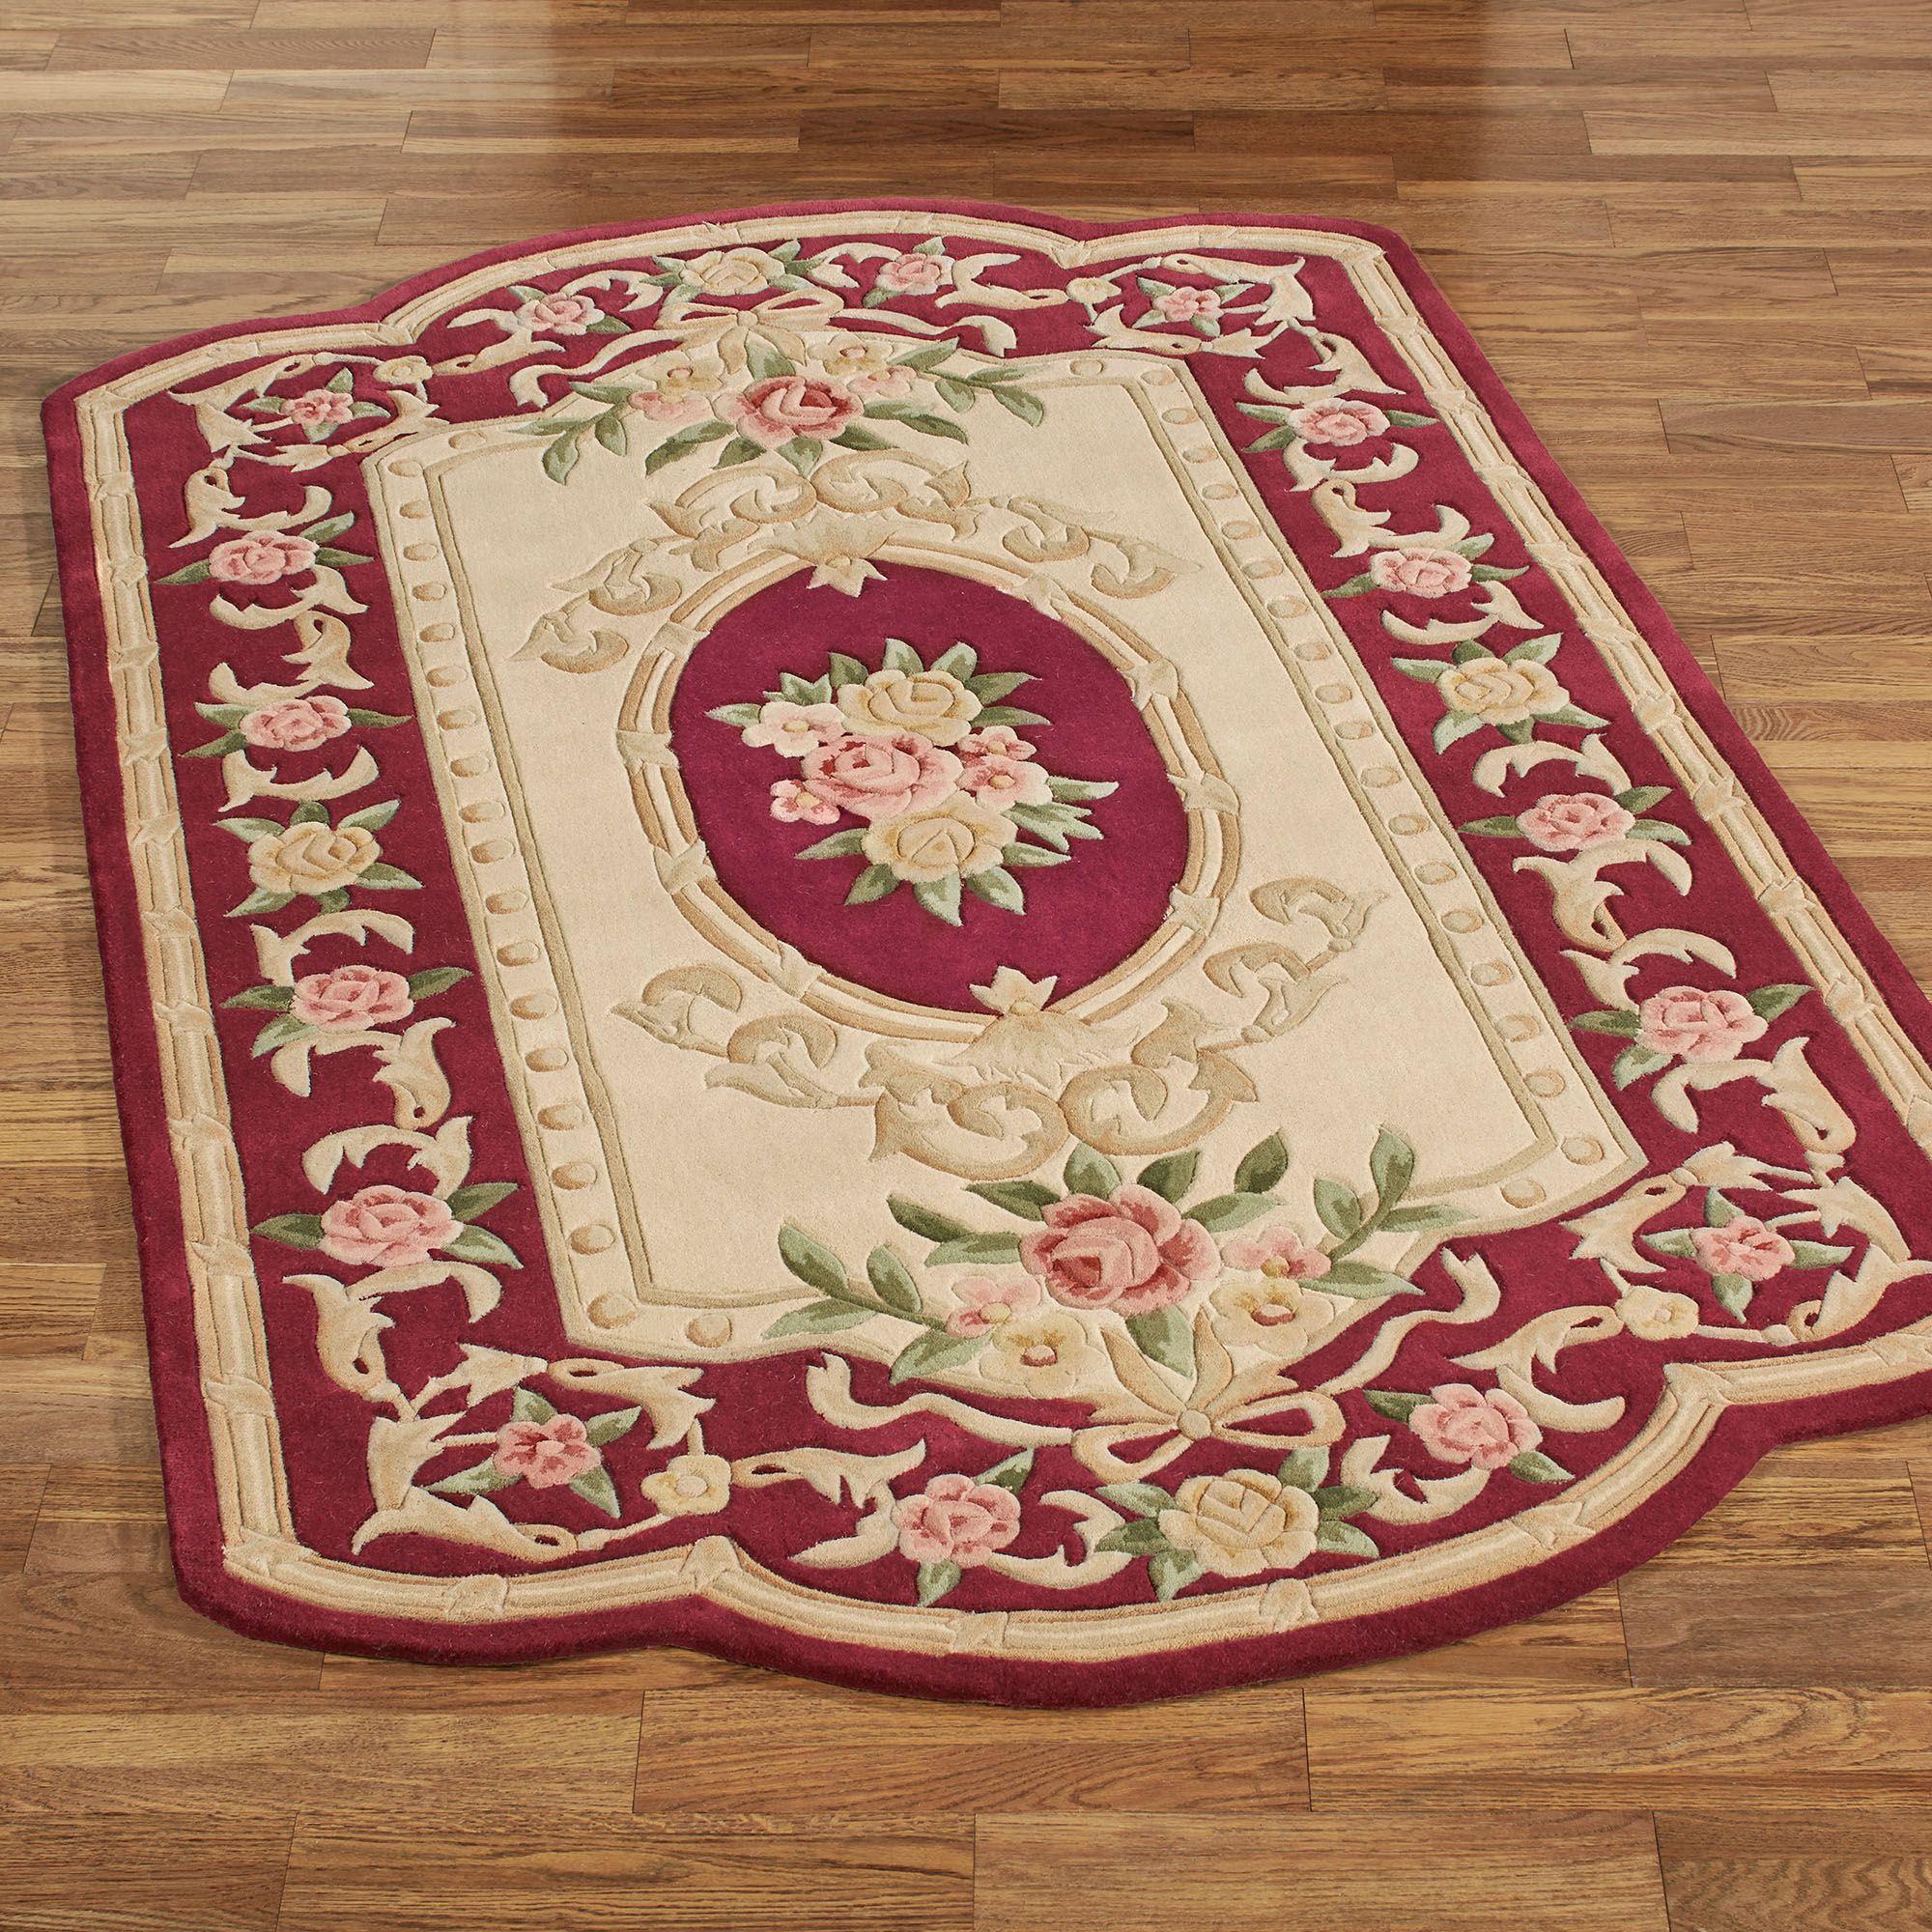 picture Flower Carpet Portia portia rose ruby aubusson area rugs